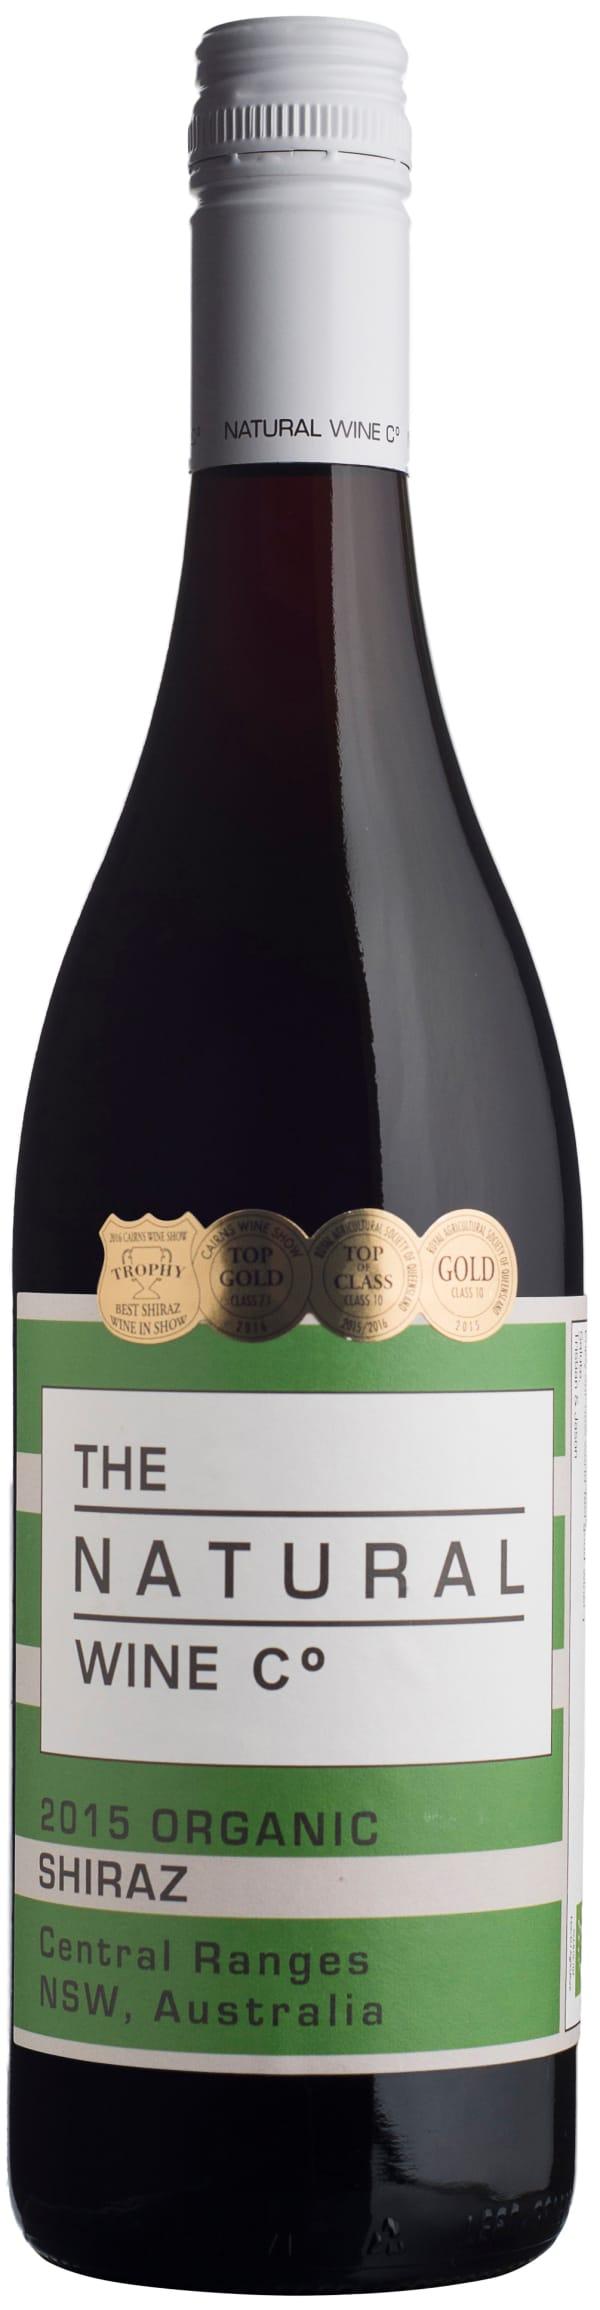 The Natural Wine Co Organic Shiraz 2019